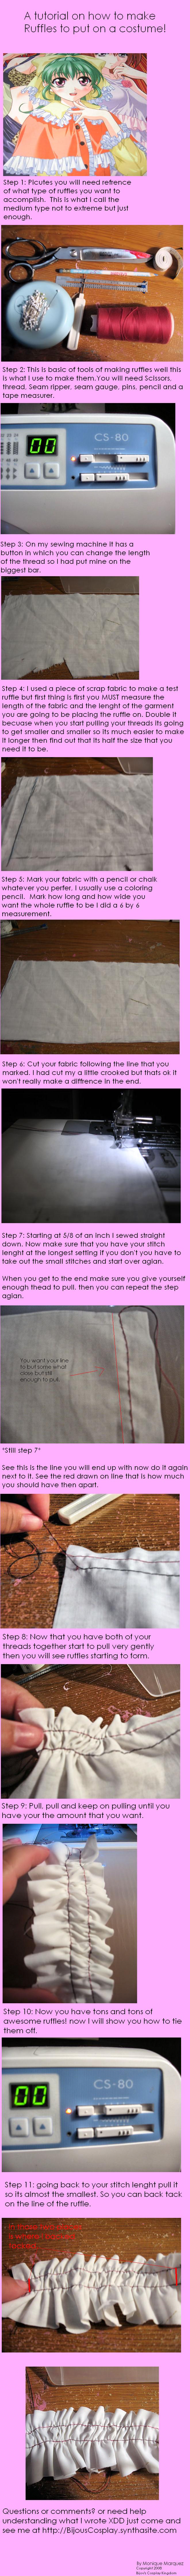 How to make ruffles by BijousCosplay